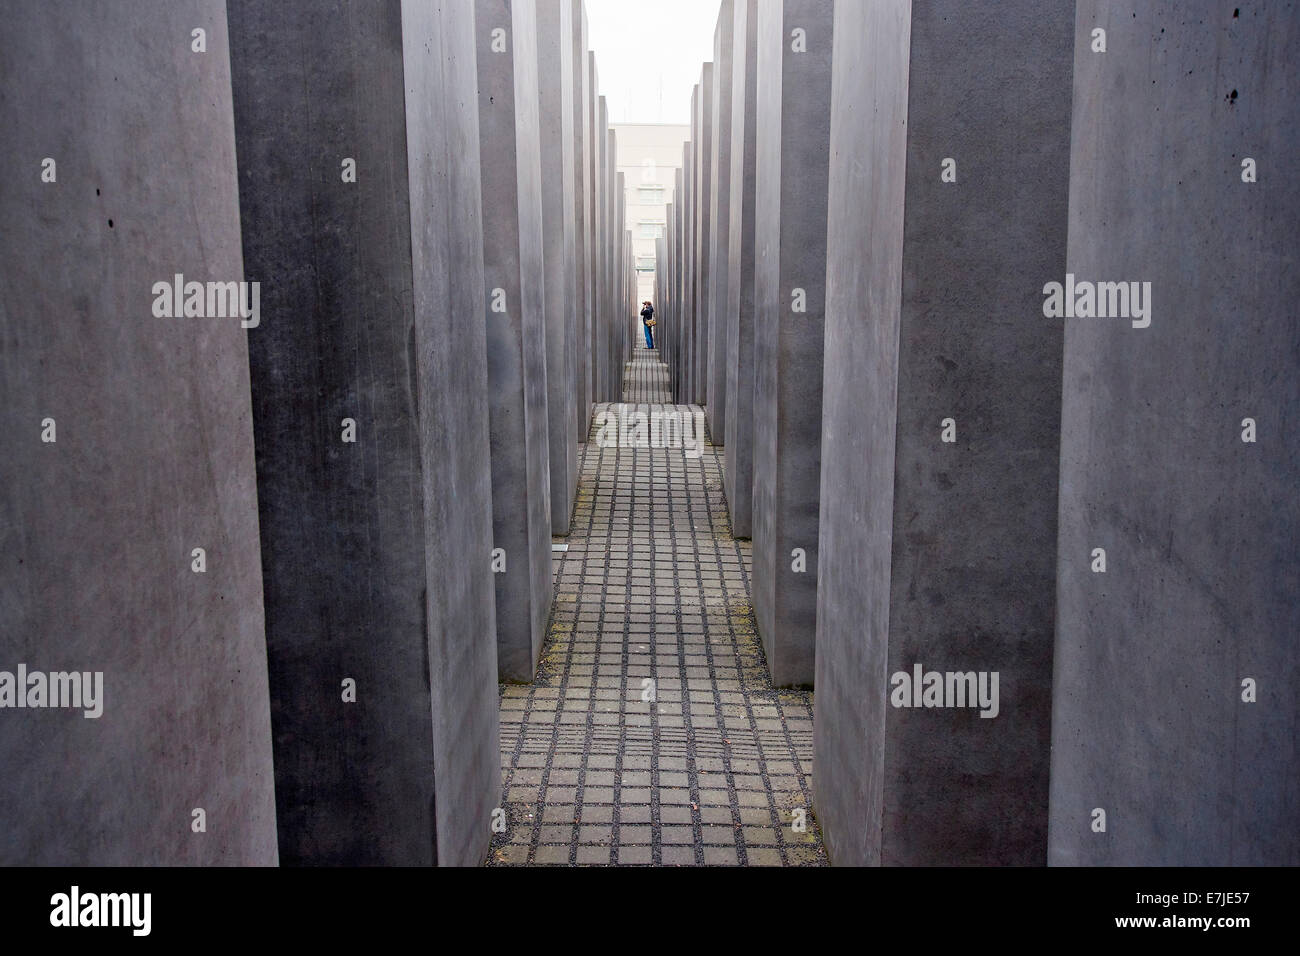 Germany, Europe, Berlin, monument, Jew, steles, stele monument, Holocaust, Holocaust memorial, memorial - Stock Image